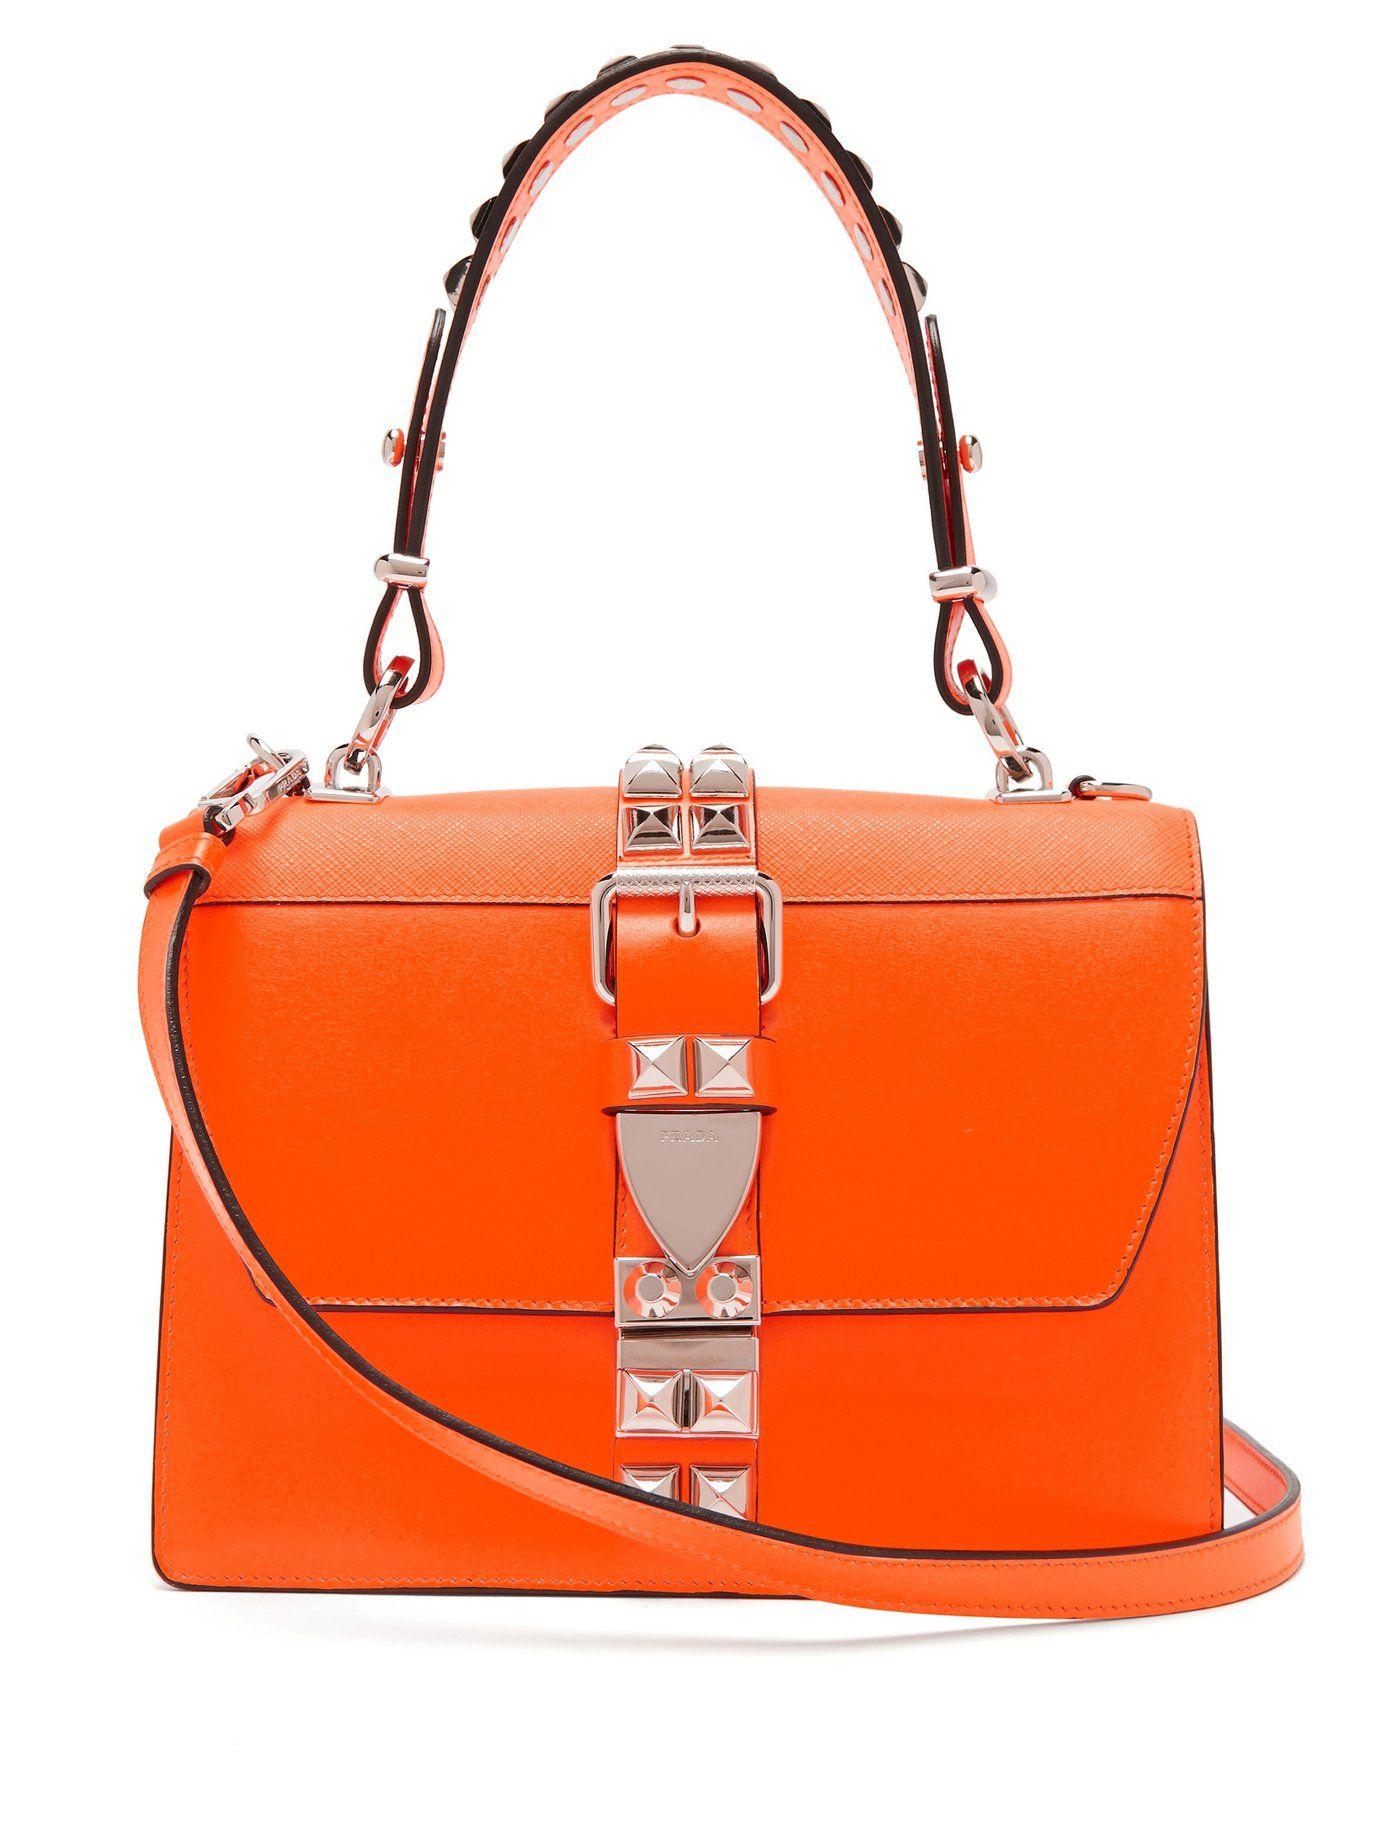 16abeb347868 EXCLUSIVE PRADA Elektra studded leather shoulder bag £1